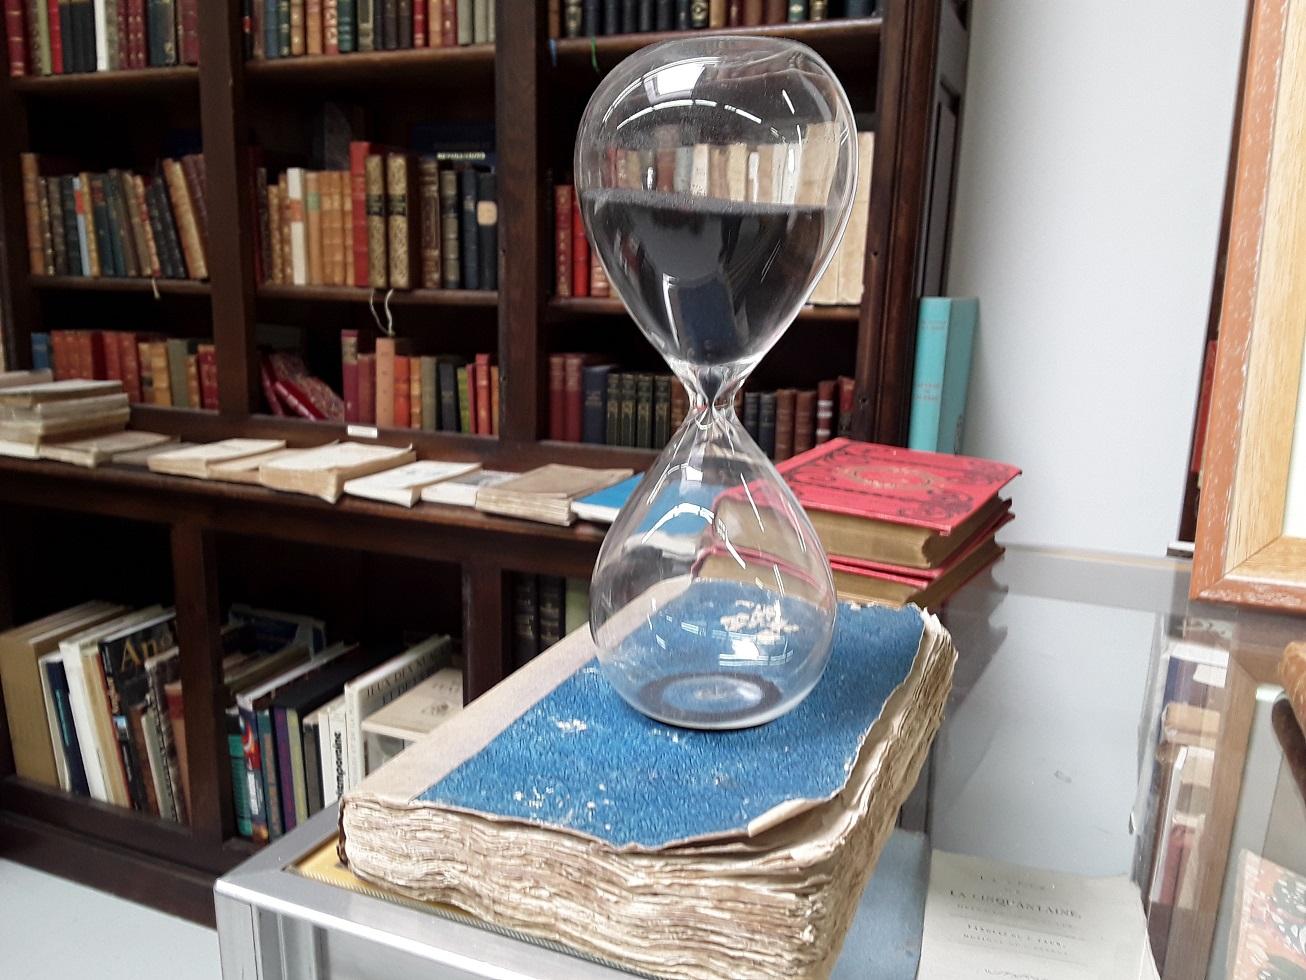 Как найти время для творчества | Вдохновить на роман